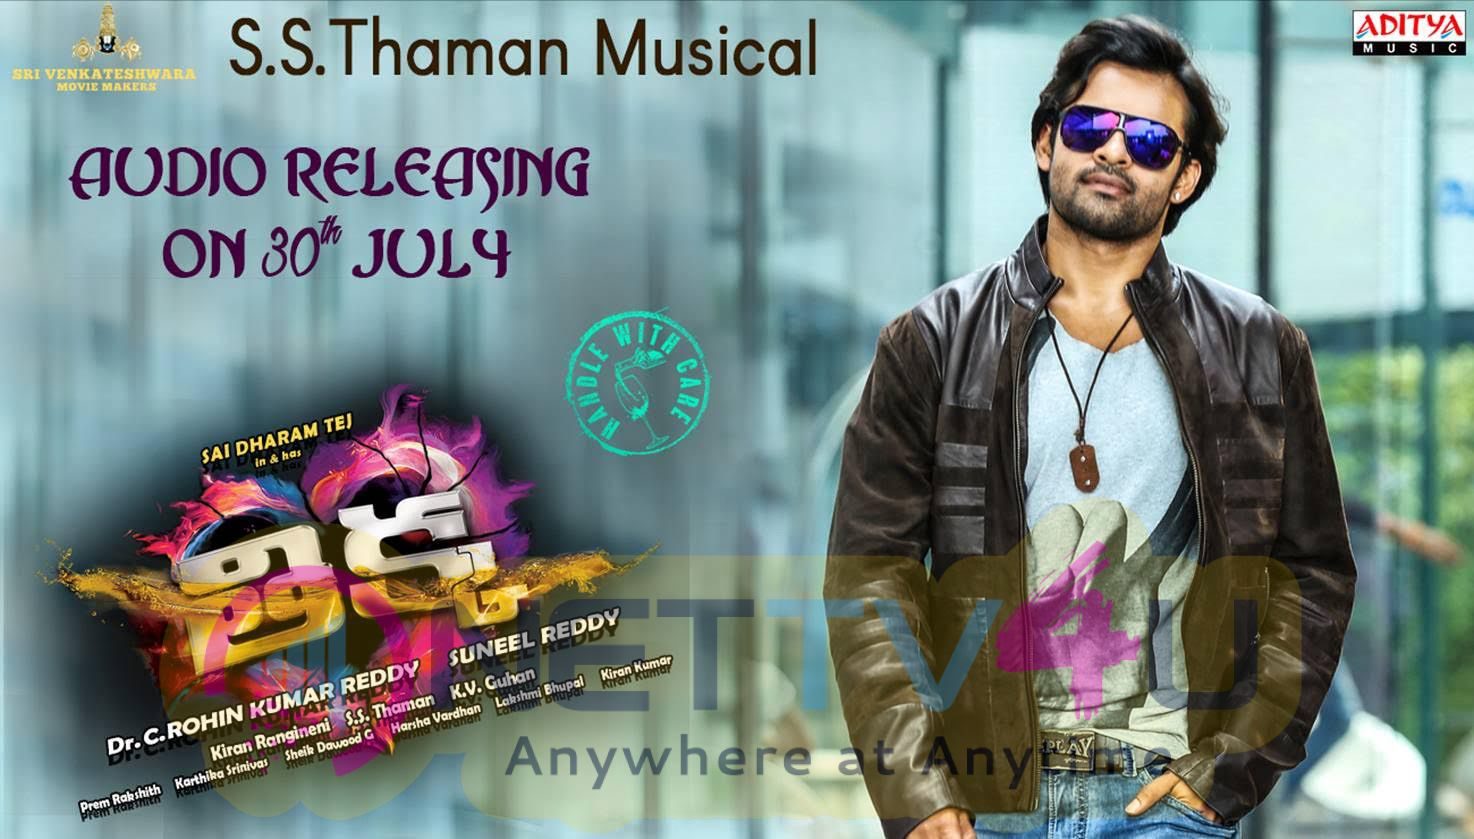 Thikka Telugu Movie Audio Launch On July 30th Poster